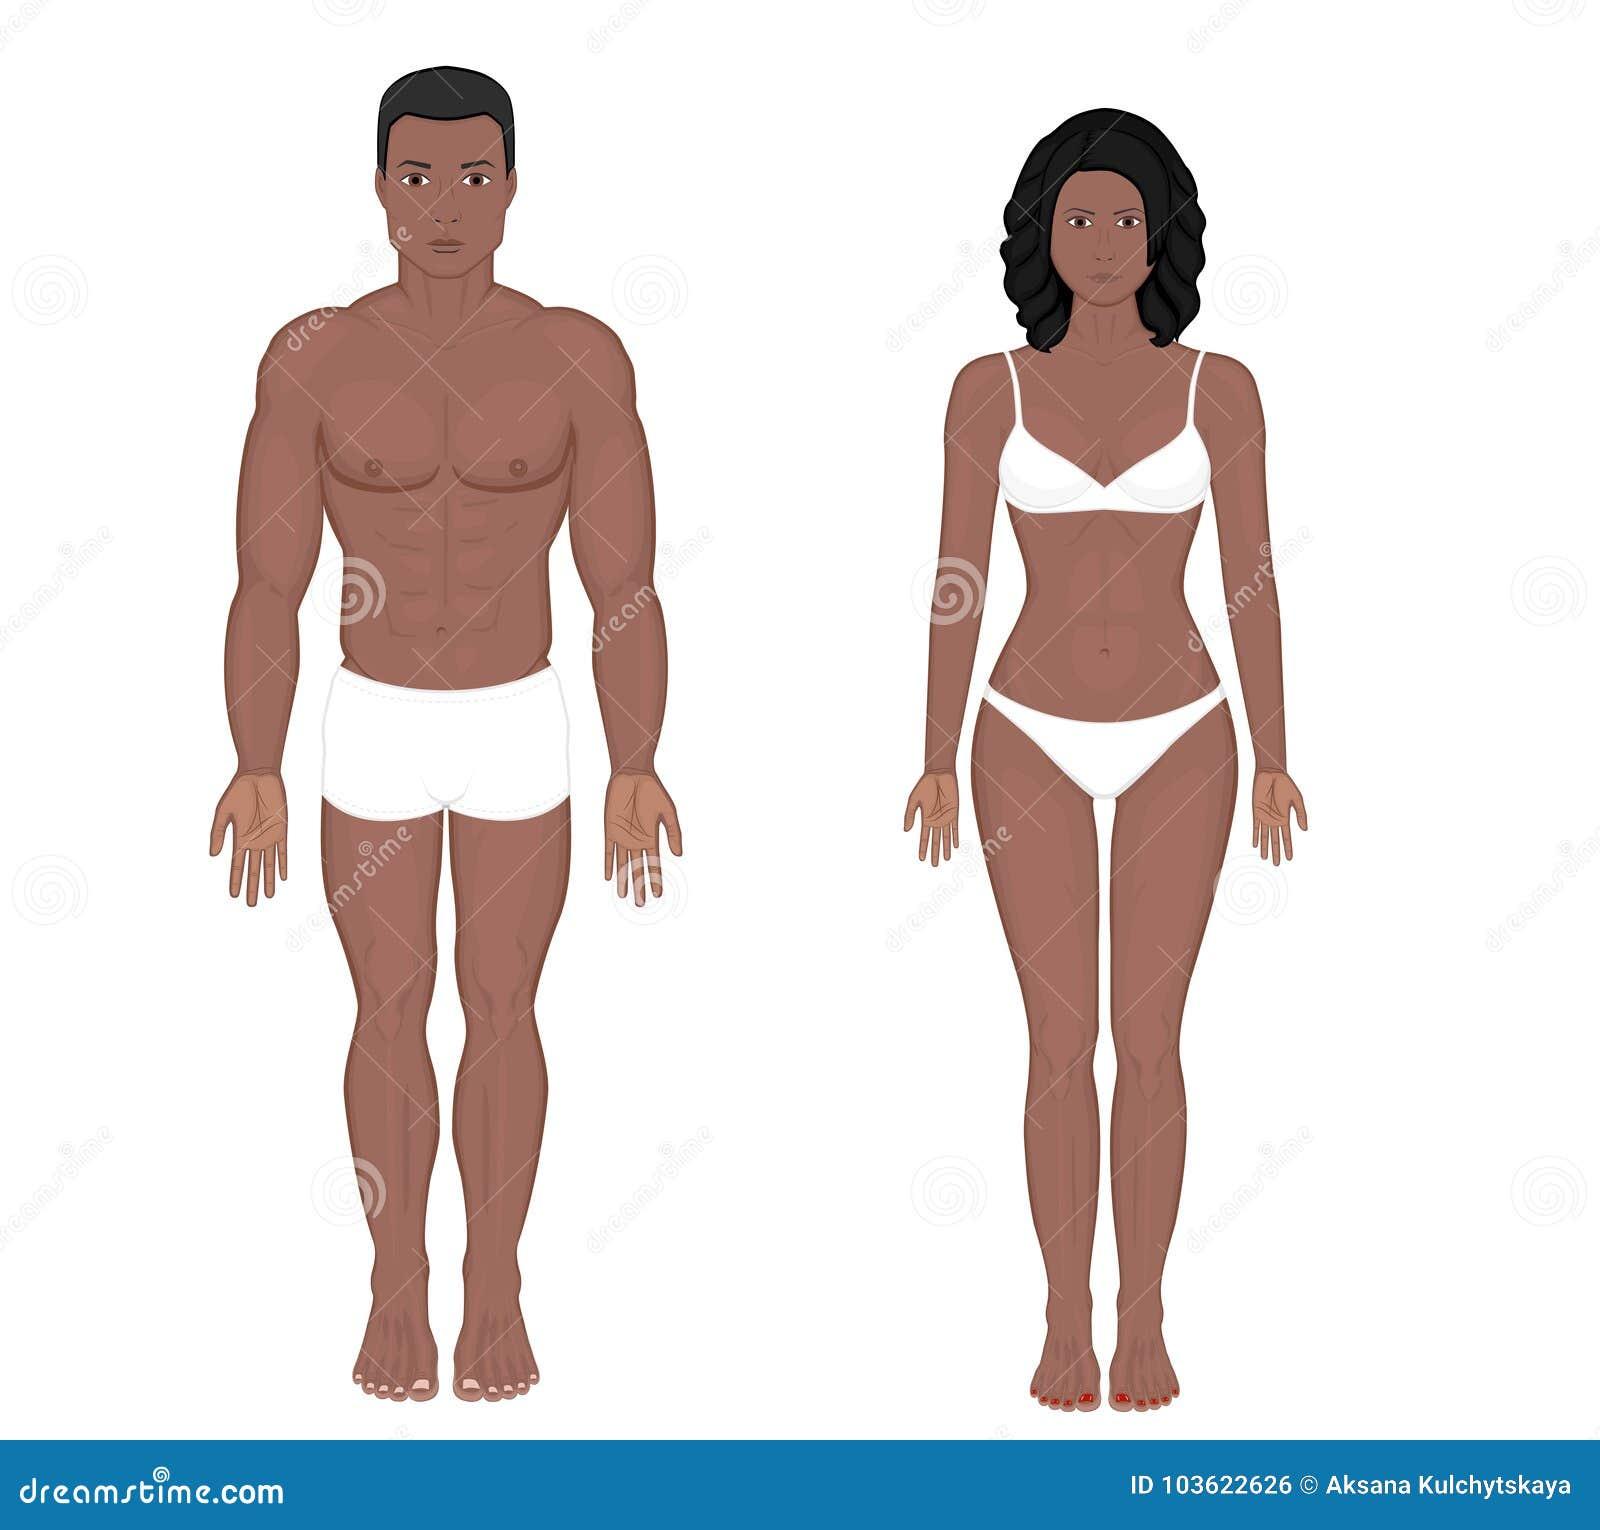 Asiatique nu, avec femme ma dit @todorazor.com